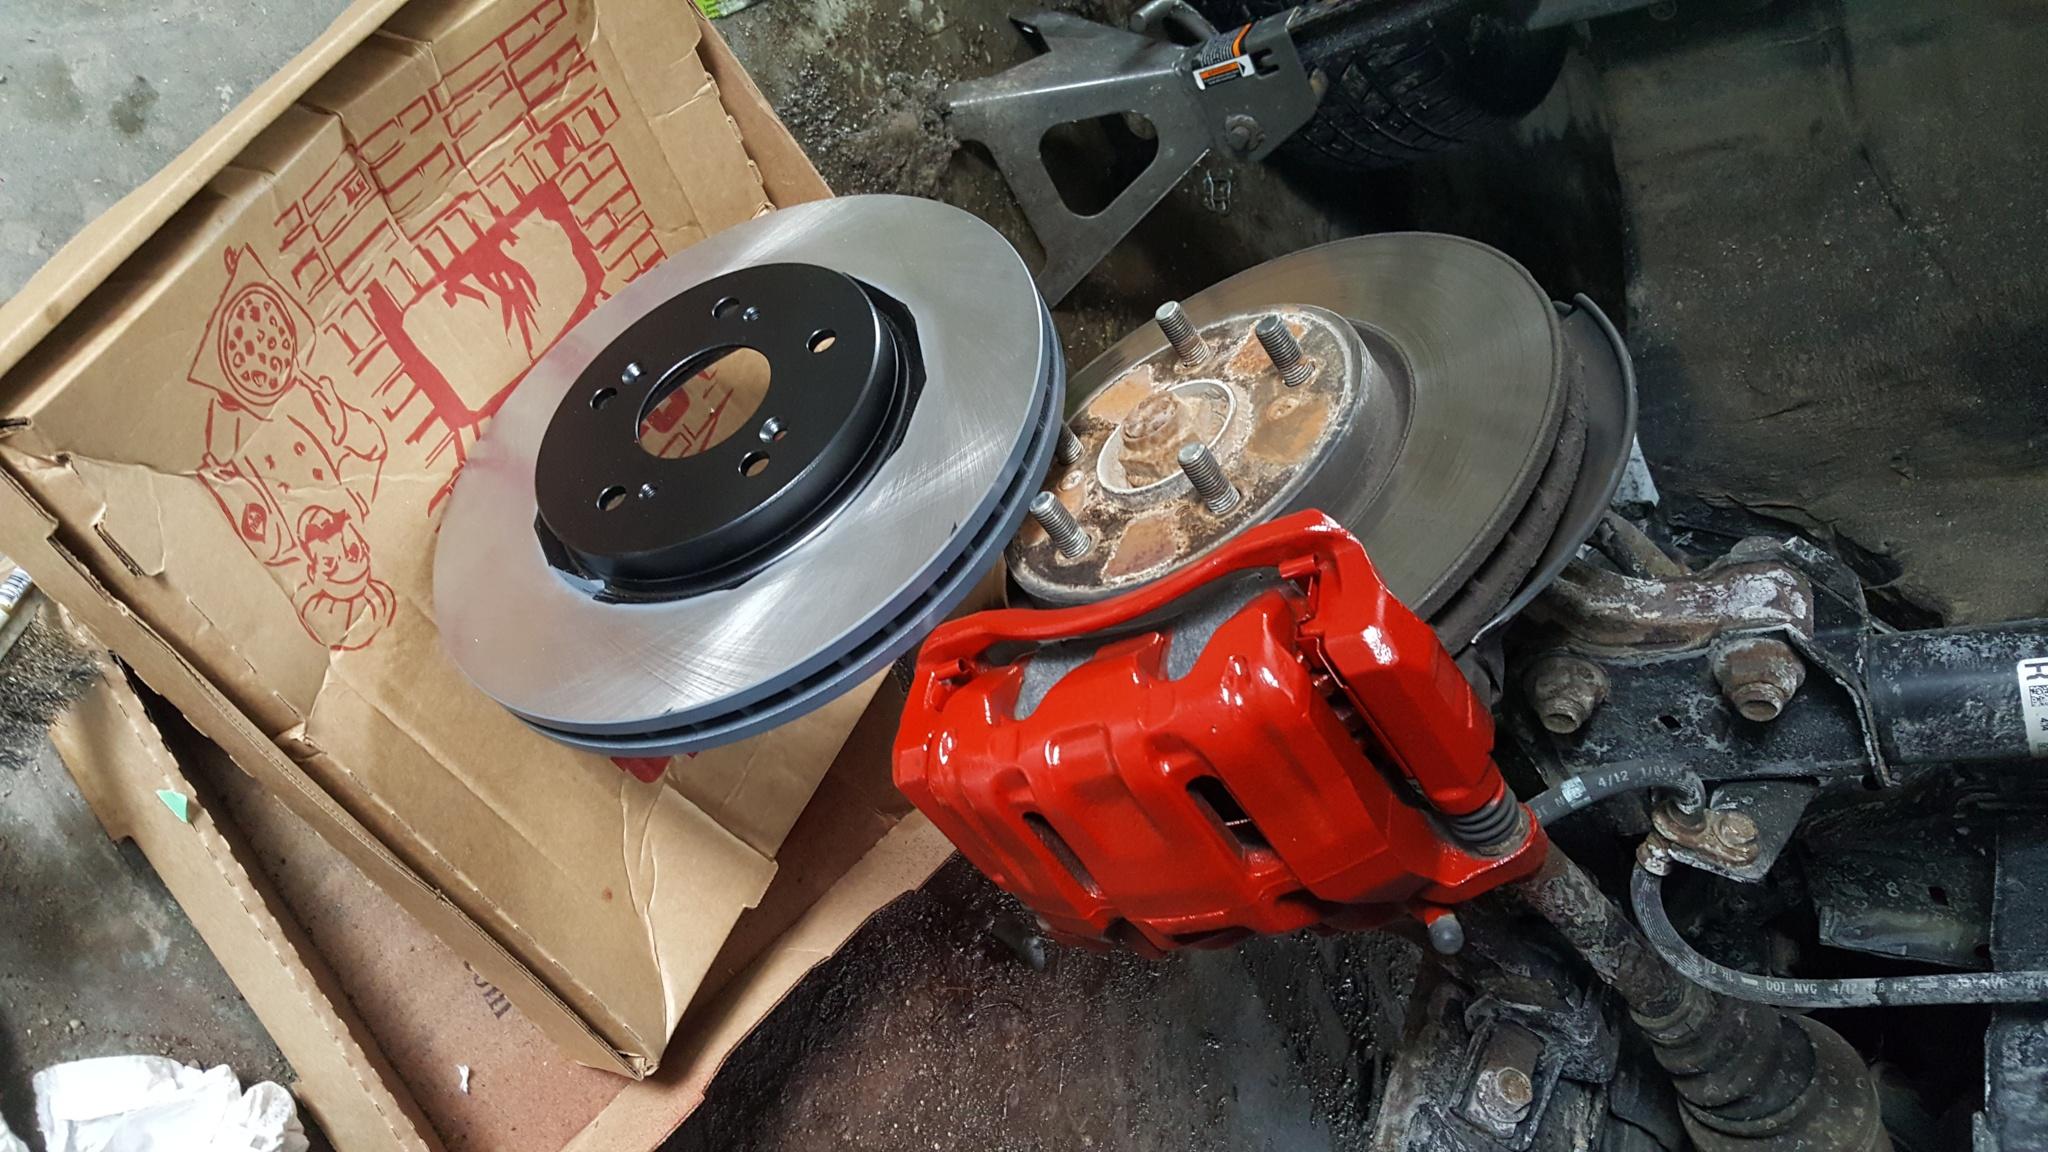 Honda CRV brakes painted red